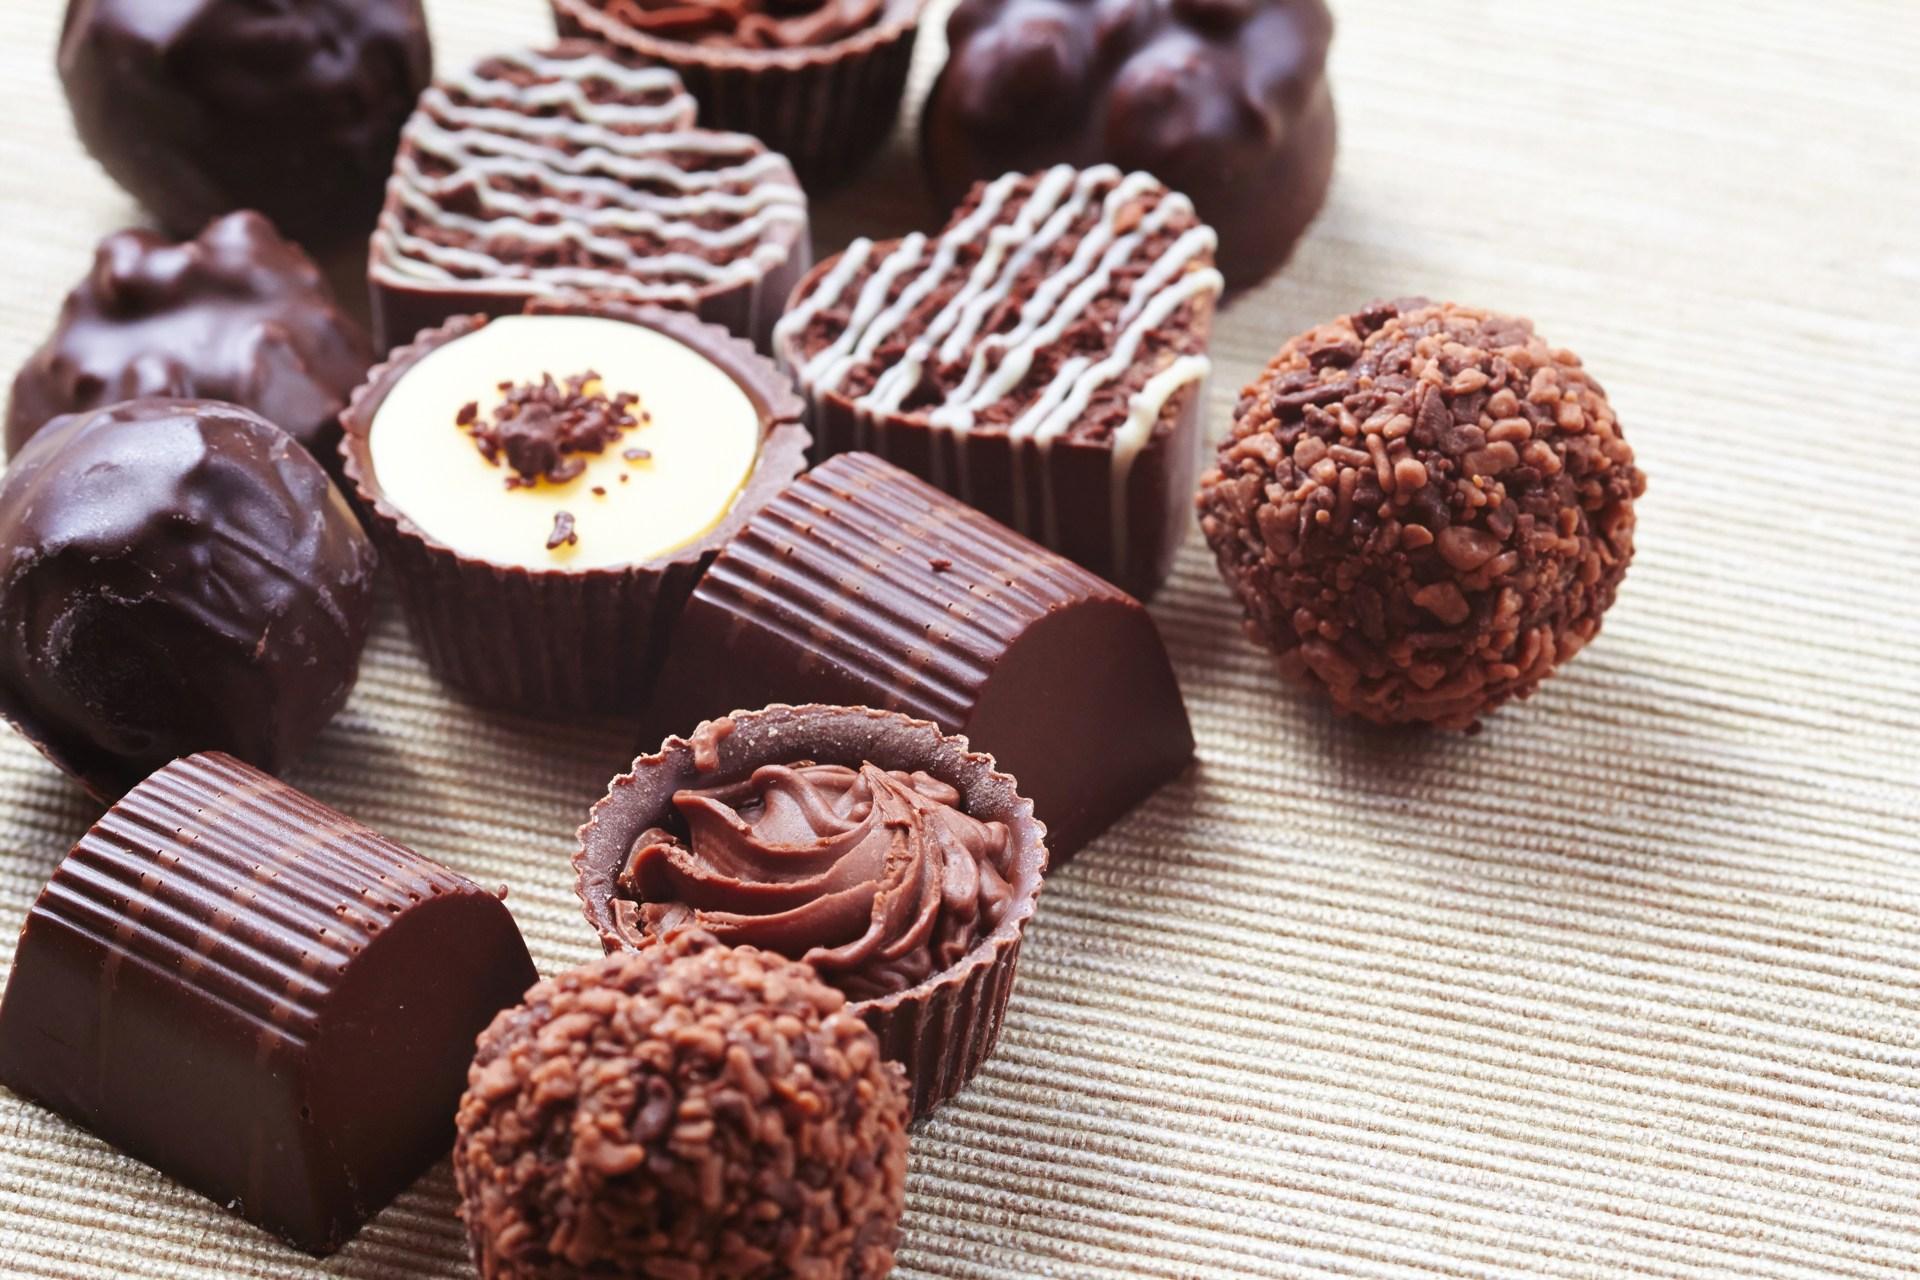 hinh nen chocolate 18